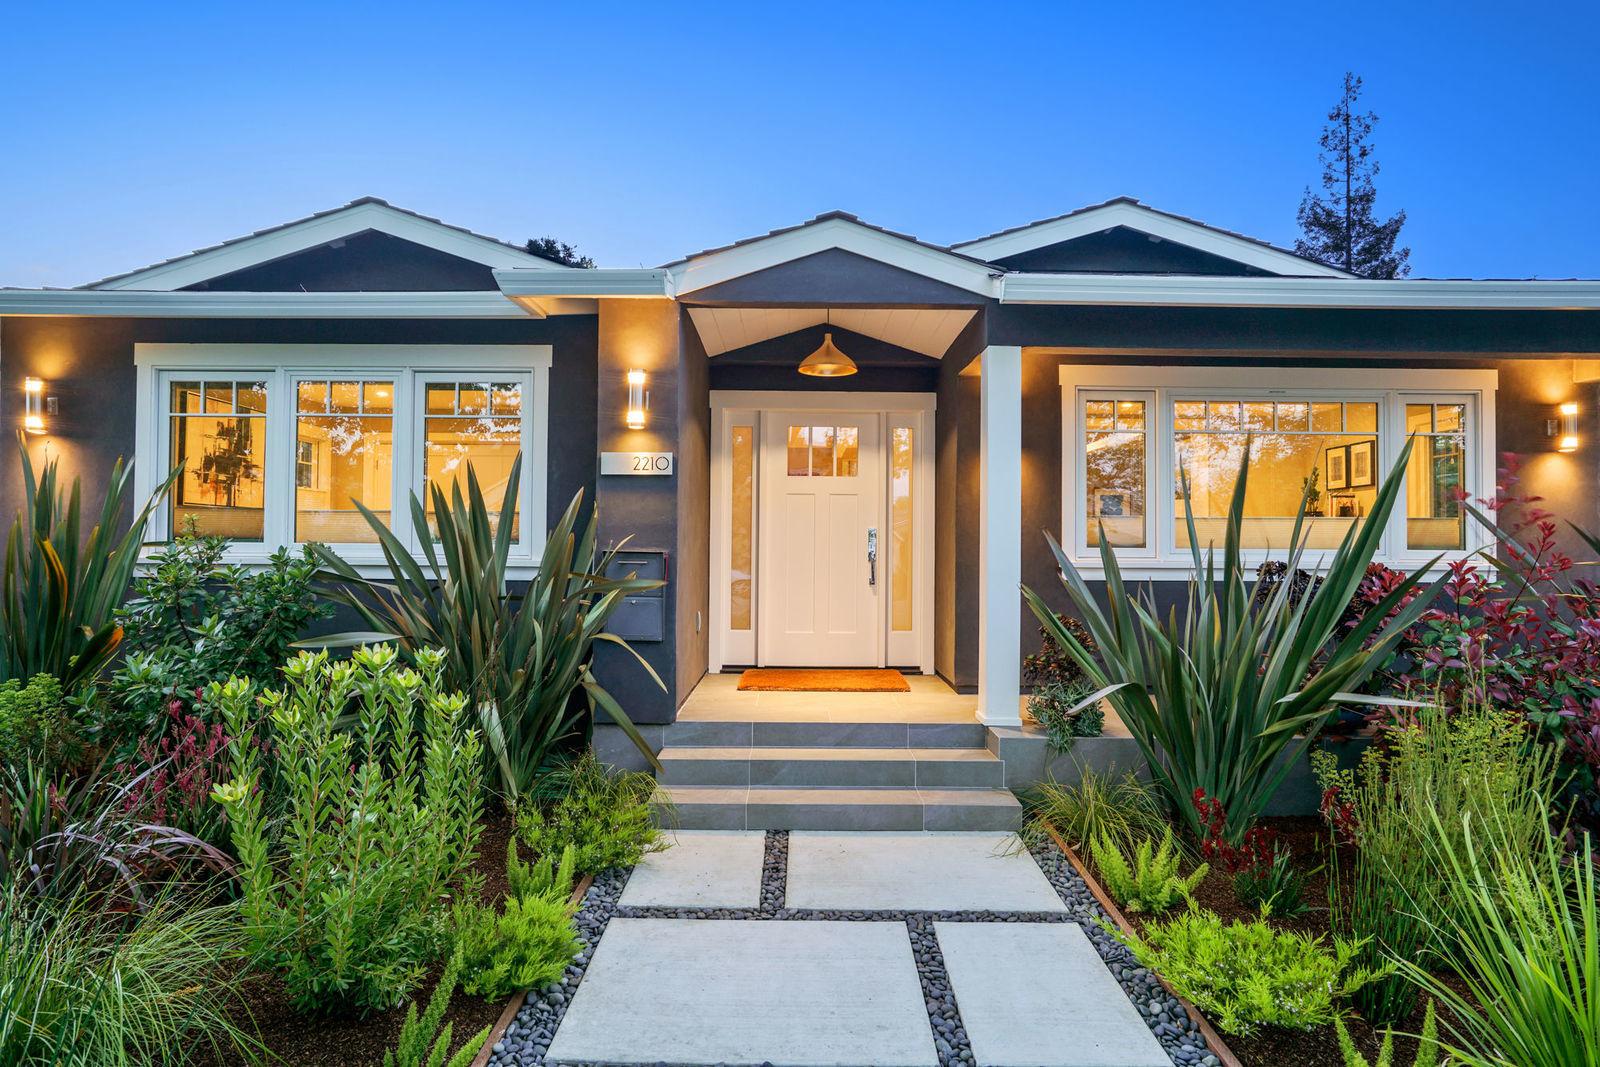 2210 Brewster Ave Redwood City, CA | $2,225,000